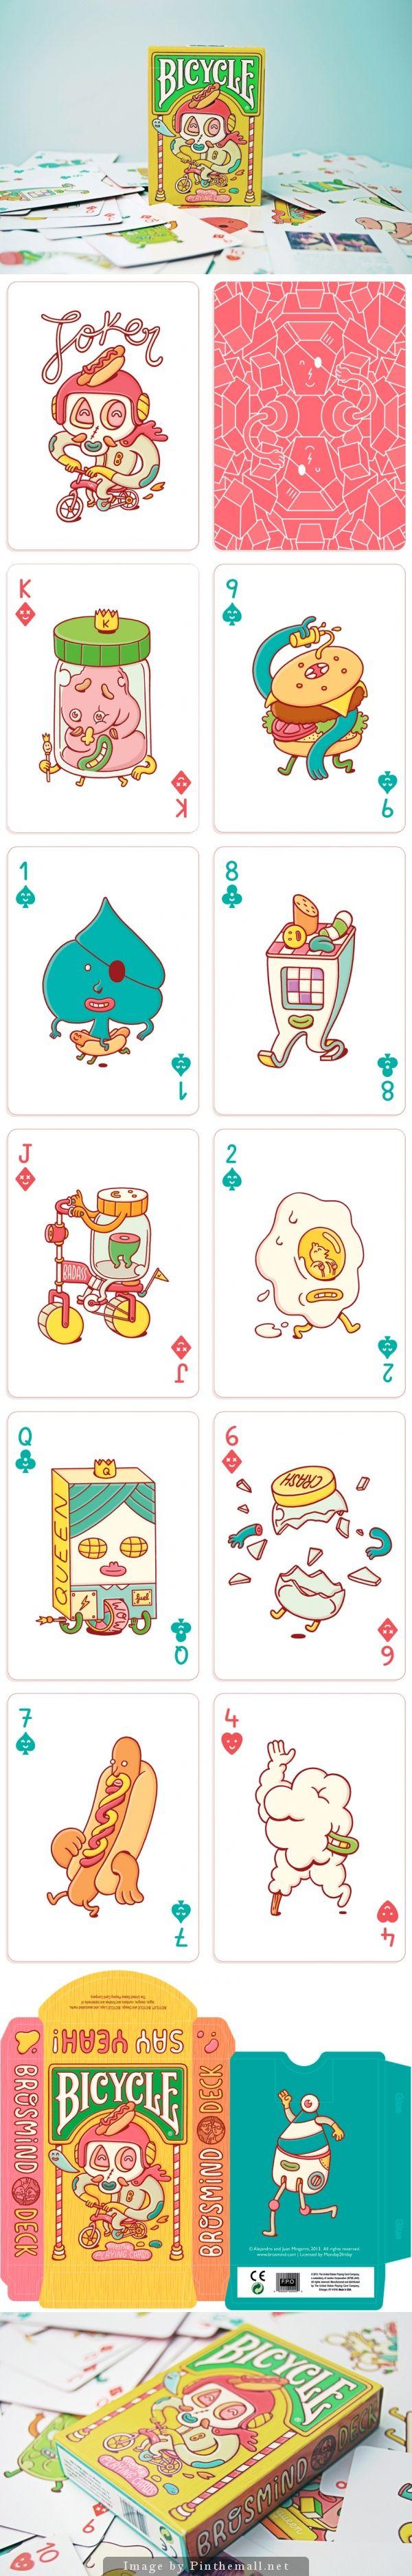 Bicycle Shop Playing Cards Design Game Card Design Card Design